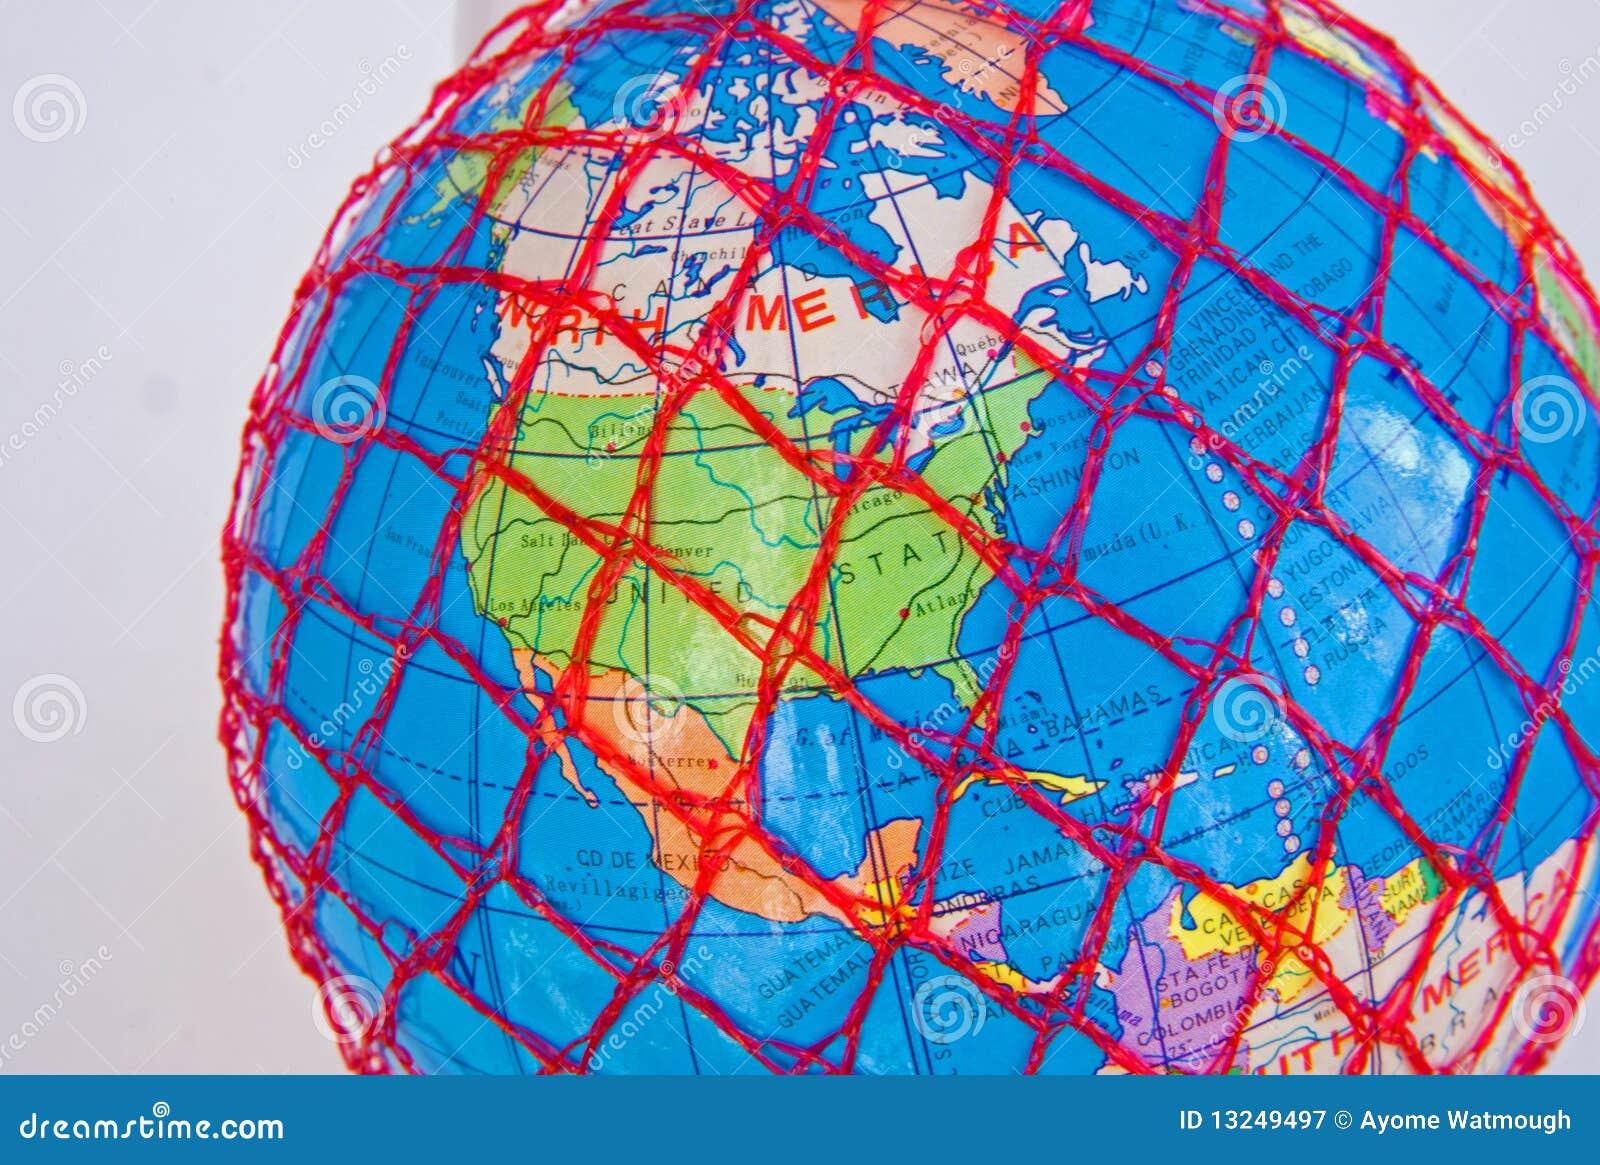 World wide web: United States of America.